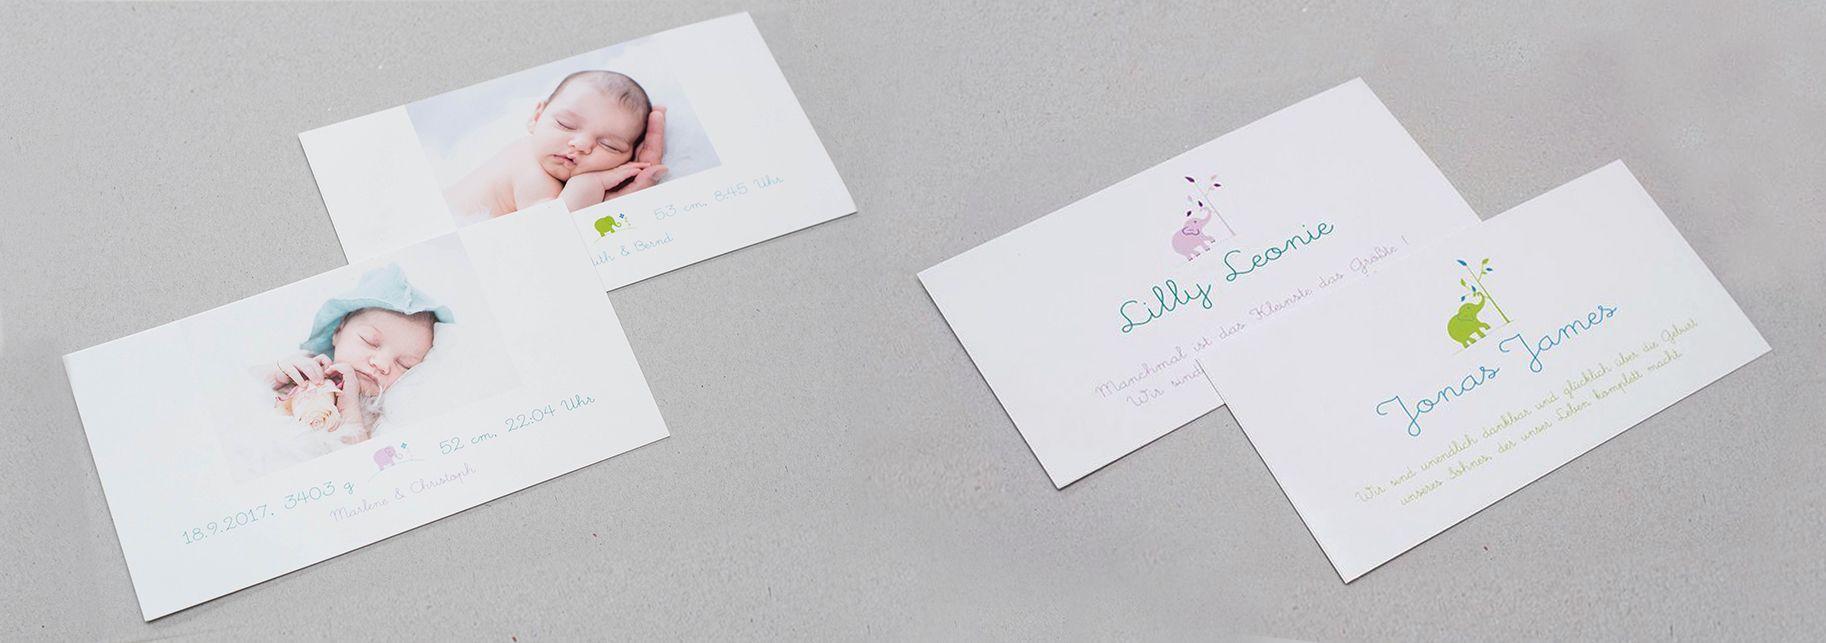 Neugeborenenfotografie Wuppertal